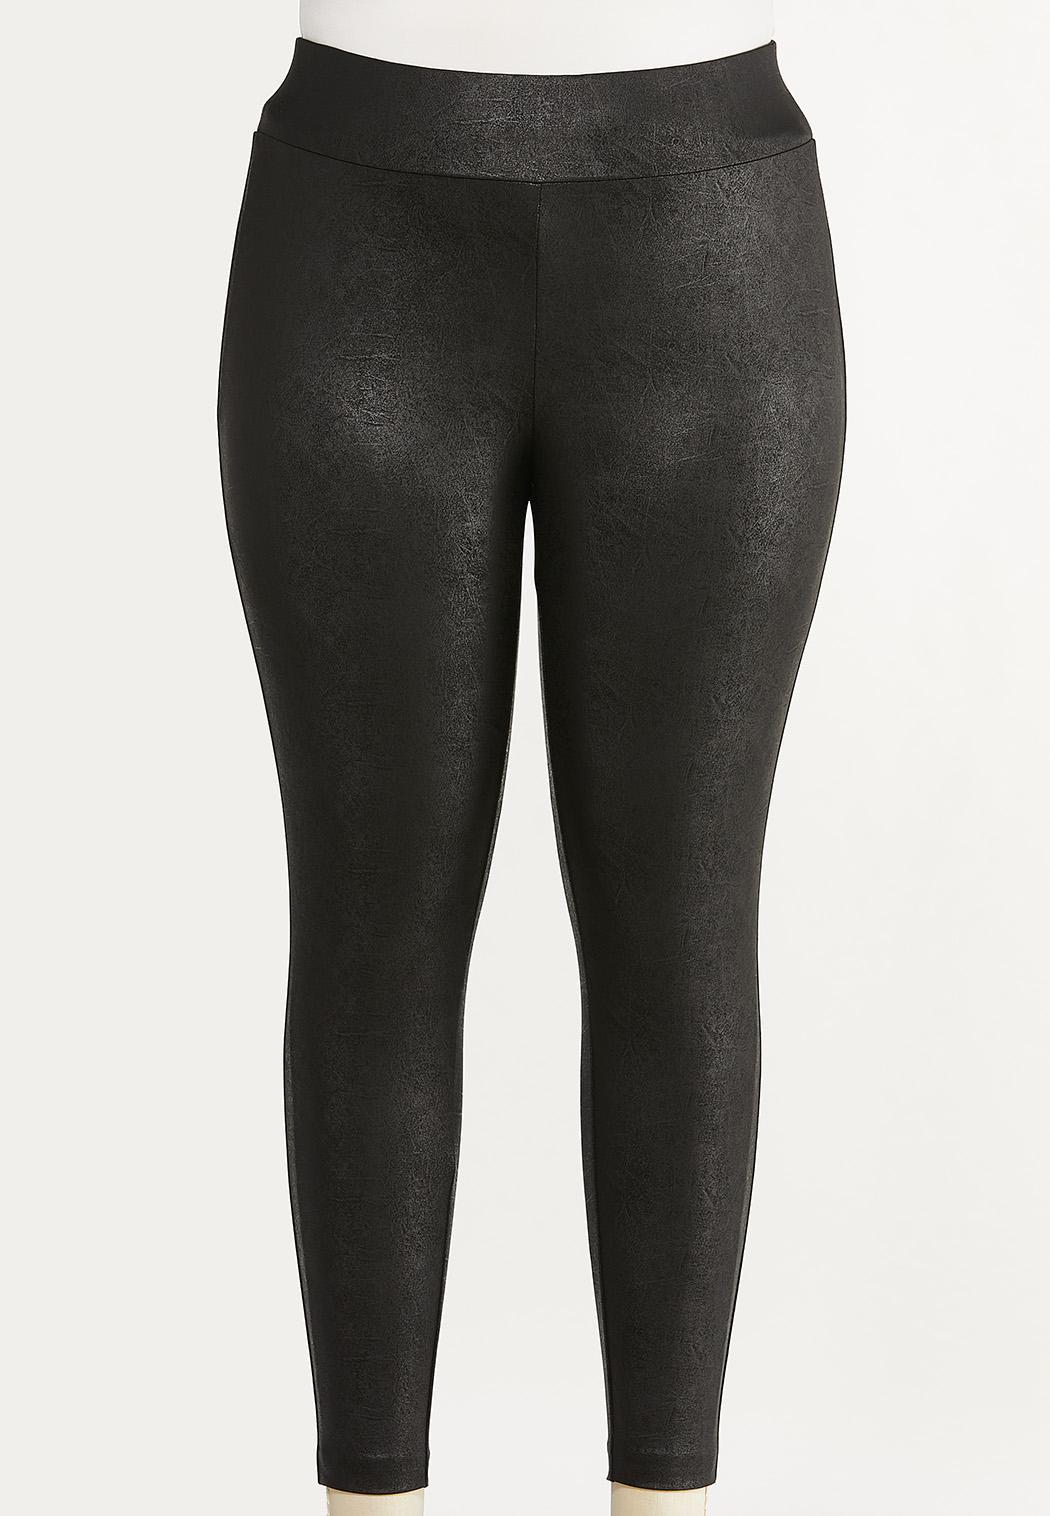 Plus Size Solid Coated Leggings